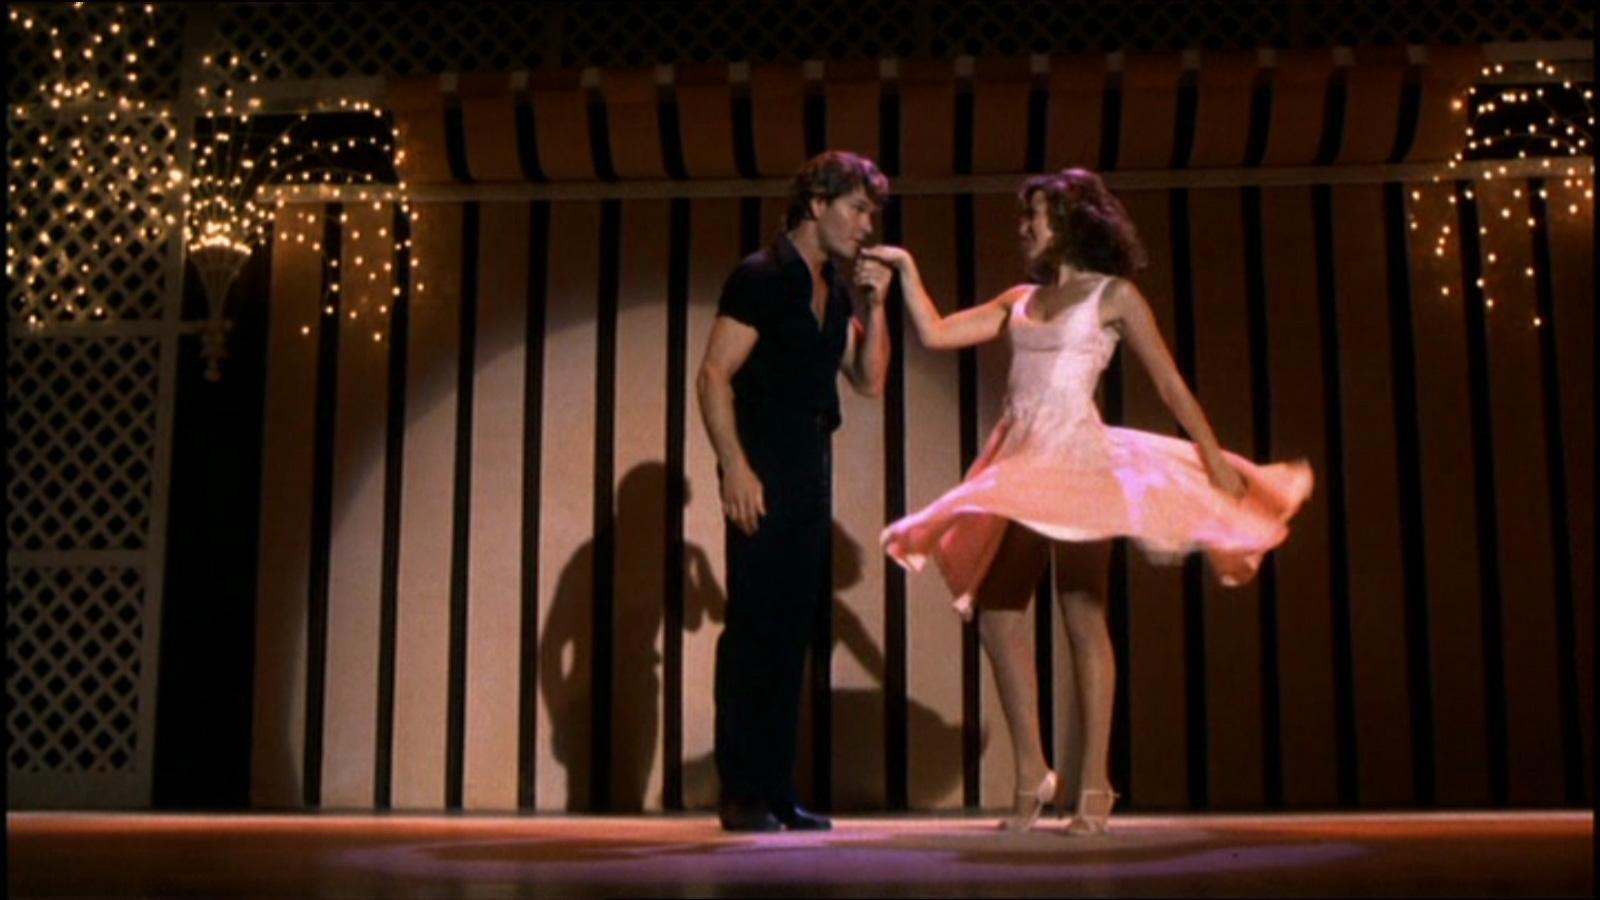 Risultati immagini per dance movie dirty dancing